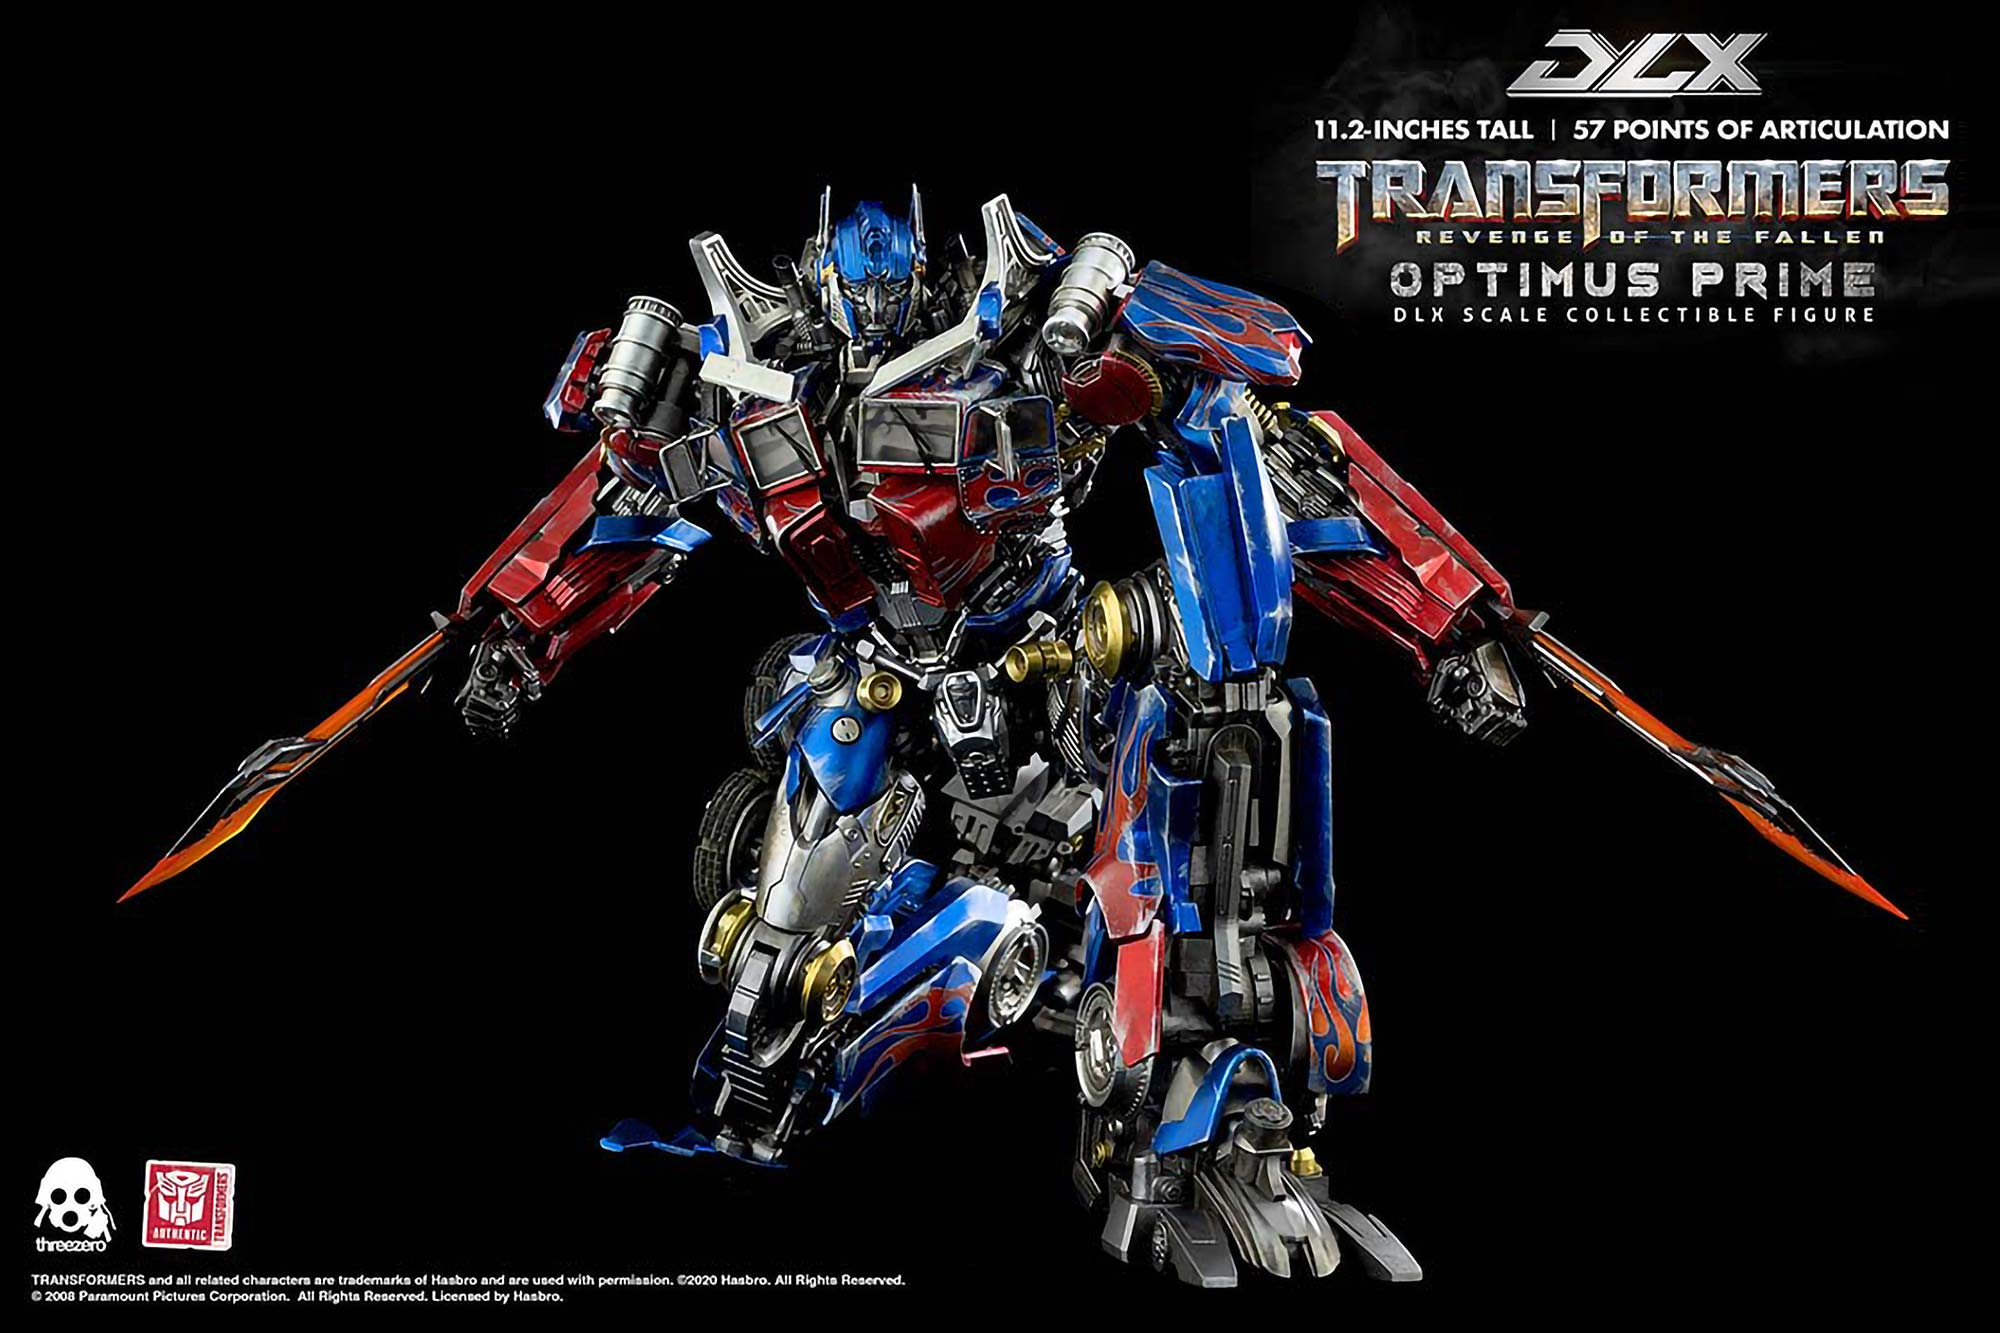 Transformers ROTF DLX Optimus Prime Figure